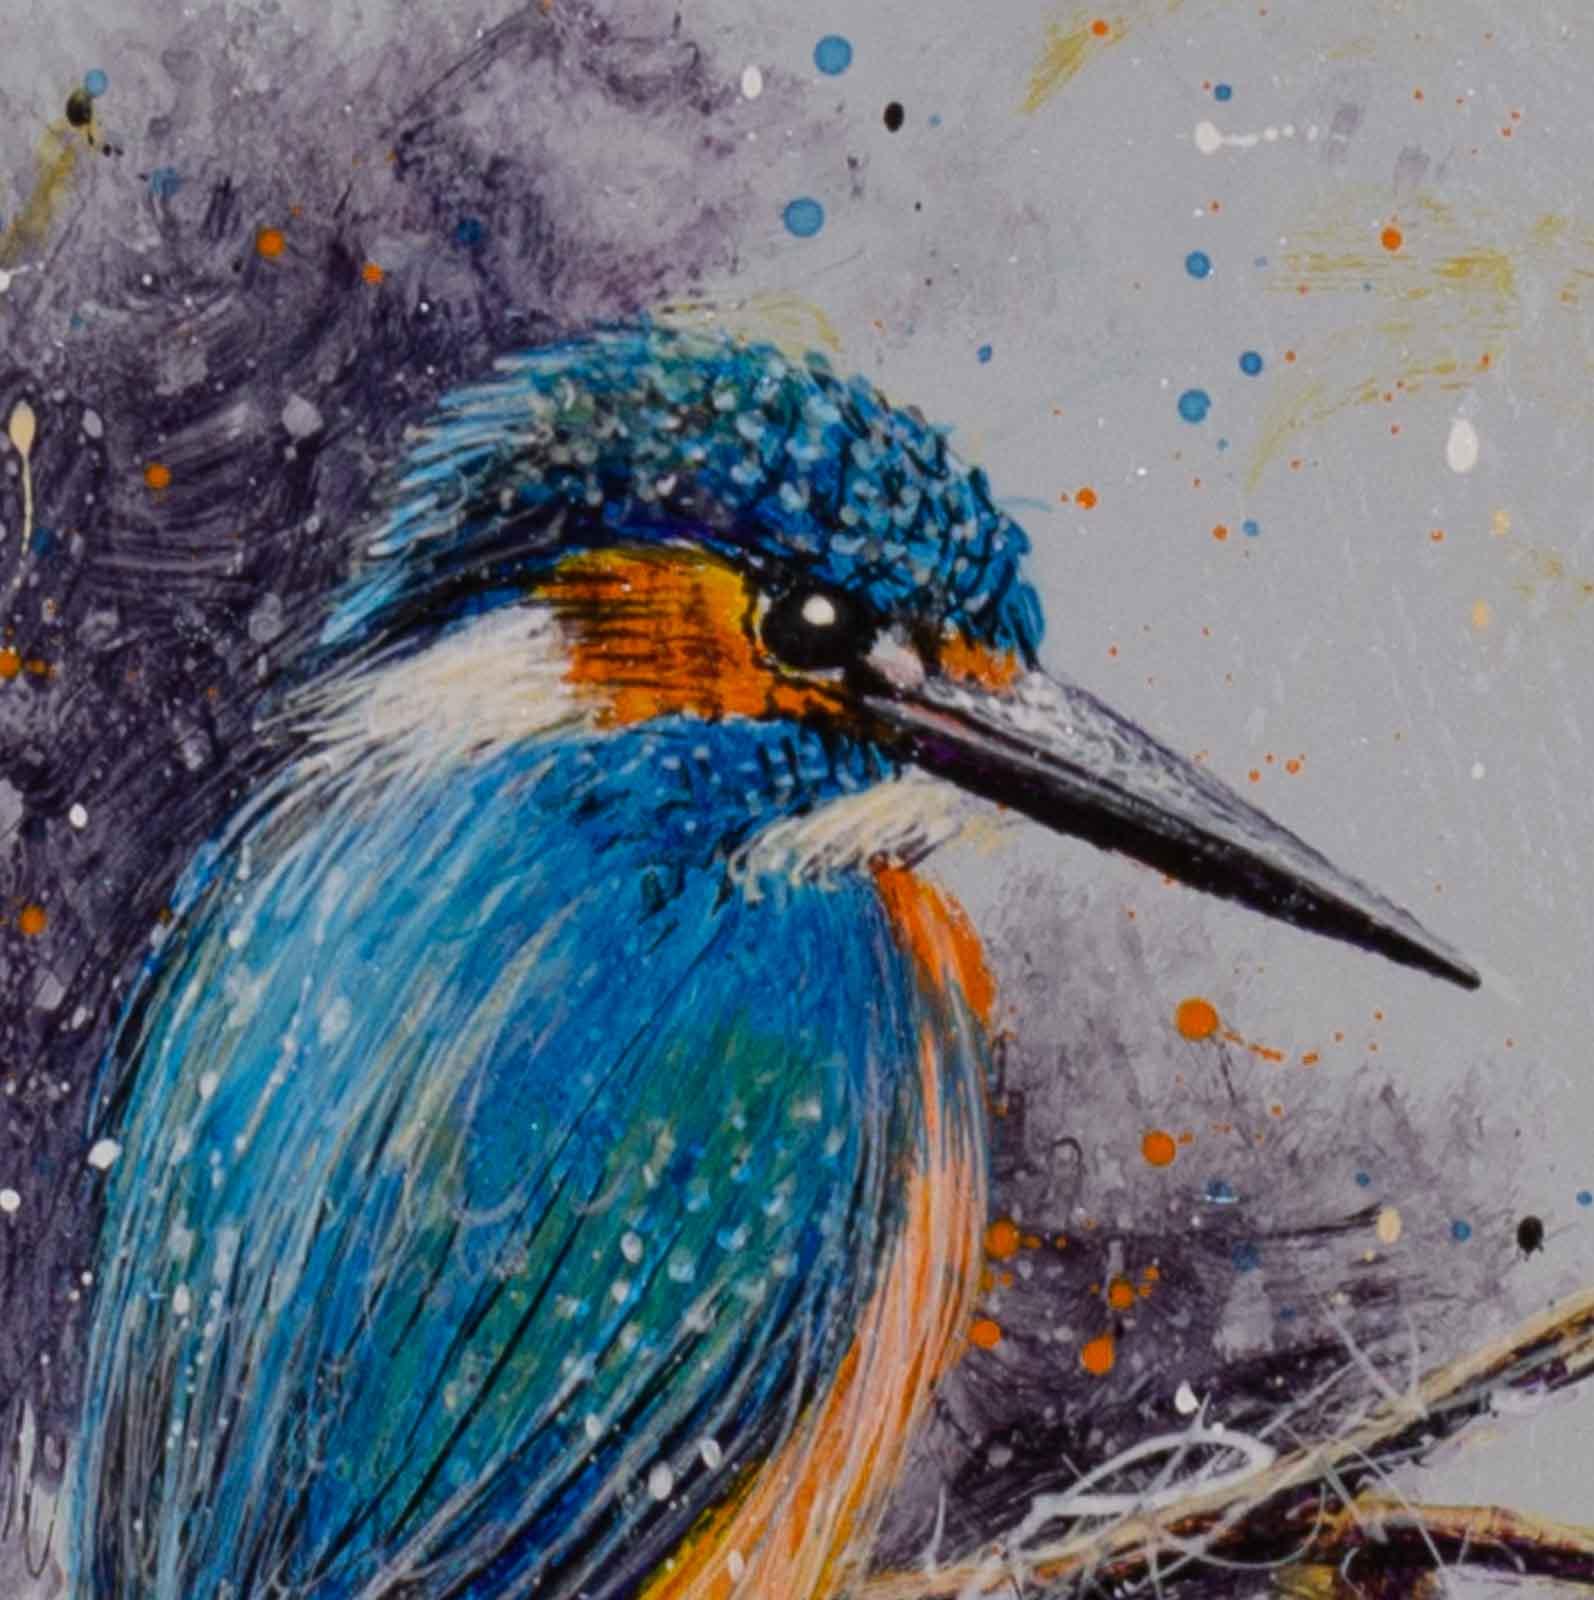 The Kingfisher